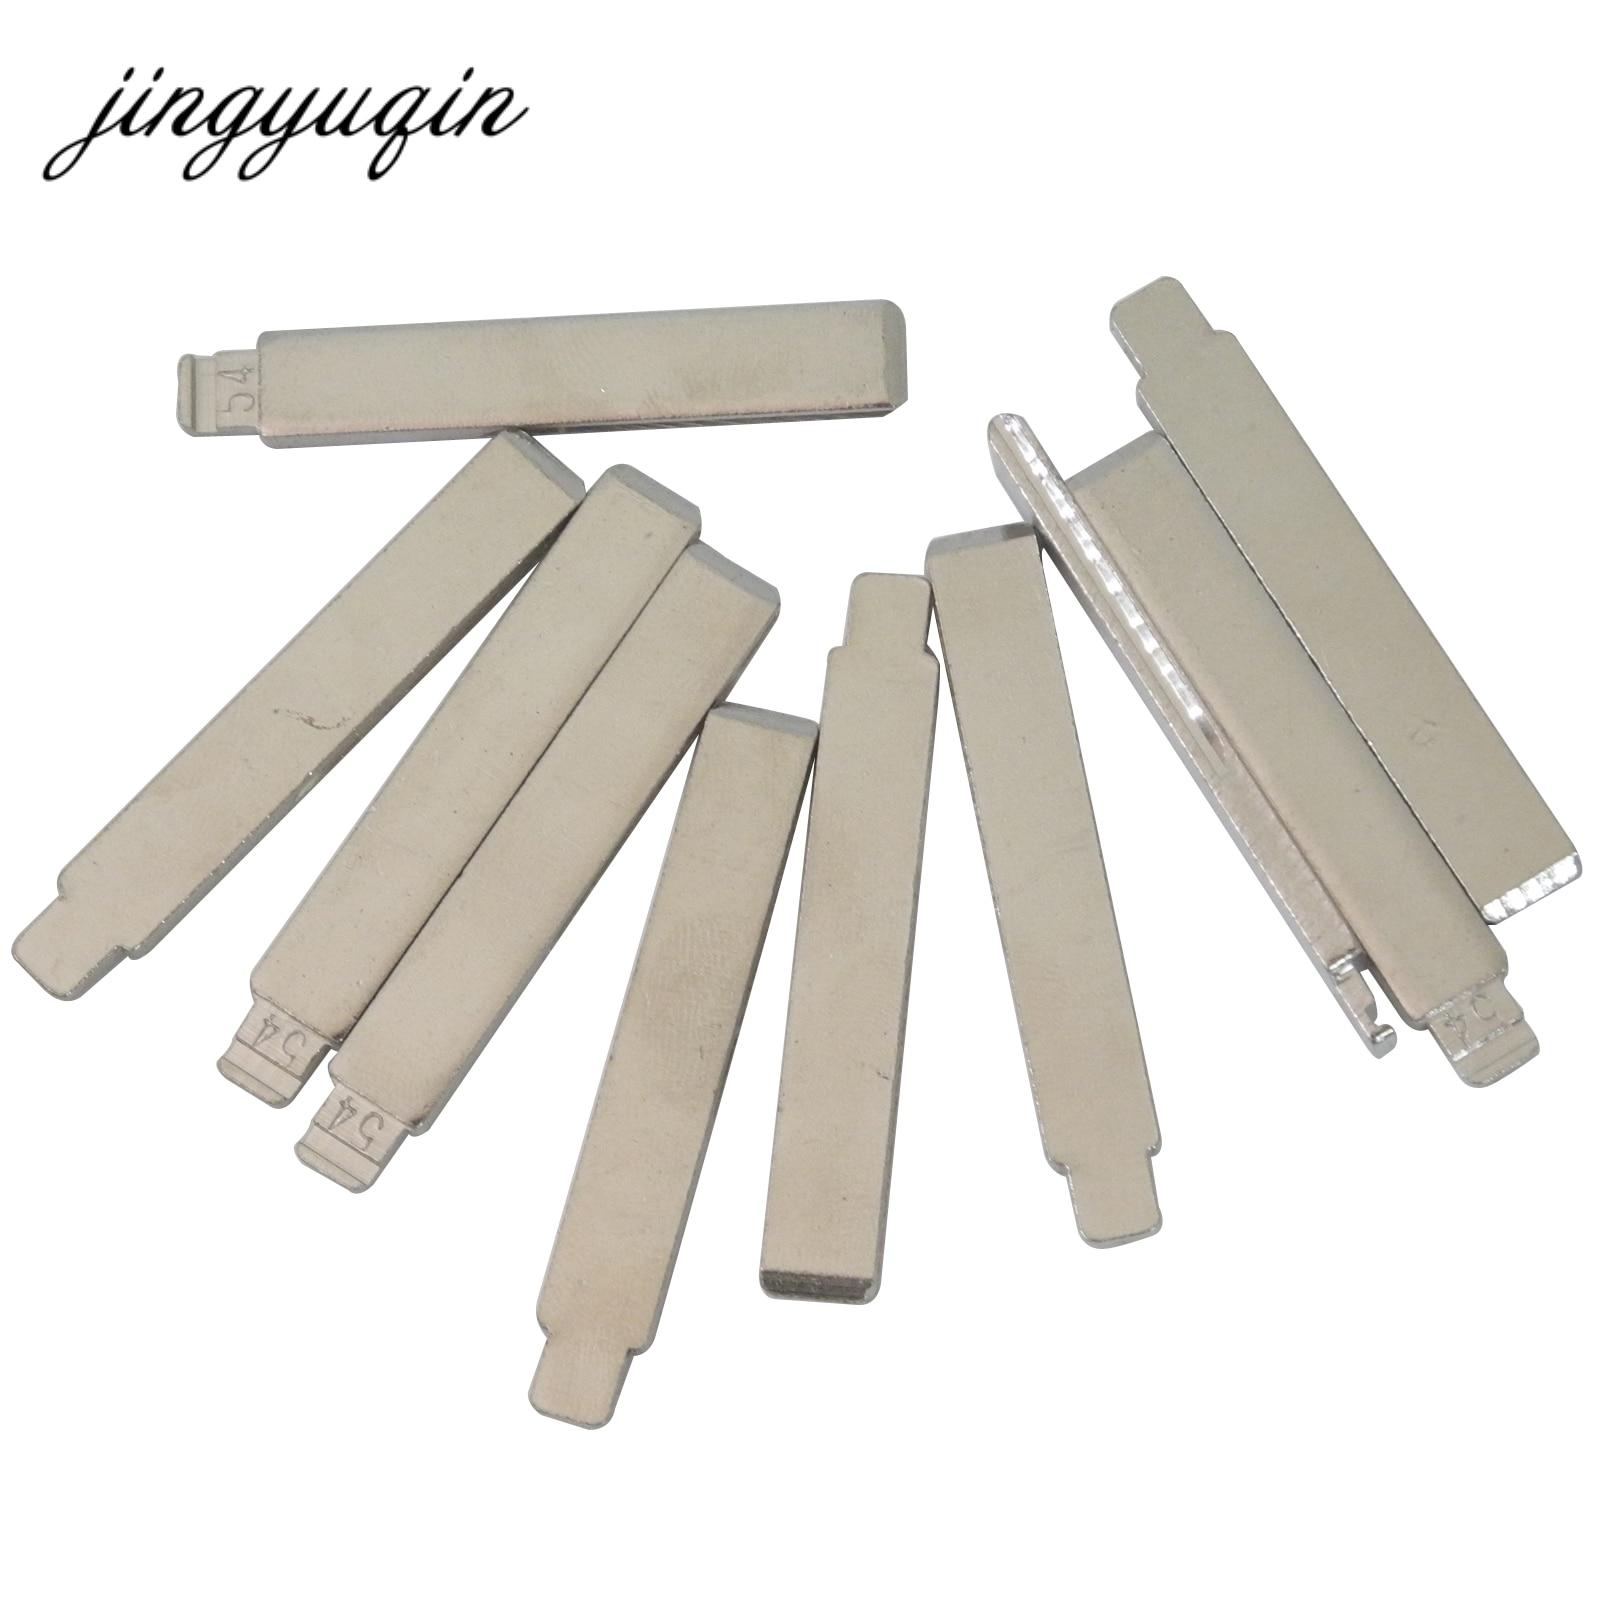 Jingyuqin 15 Stks/partij No.54 Hca/HU83 Gewijzigd Sleutel Blade Fit Voor Citroen Peugeot Flip Folding Autosleutel Leeg 54 # Met Groef